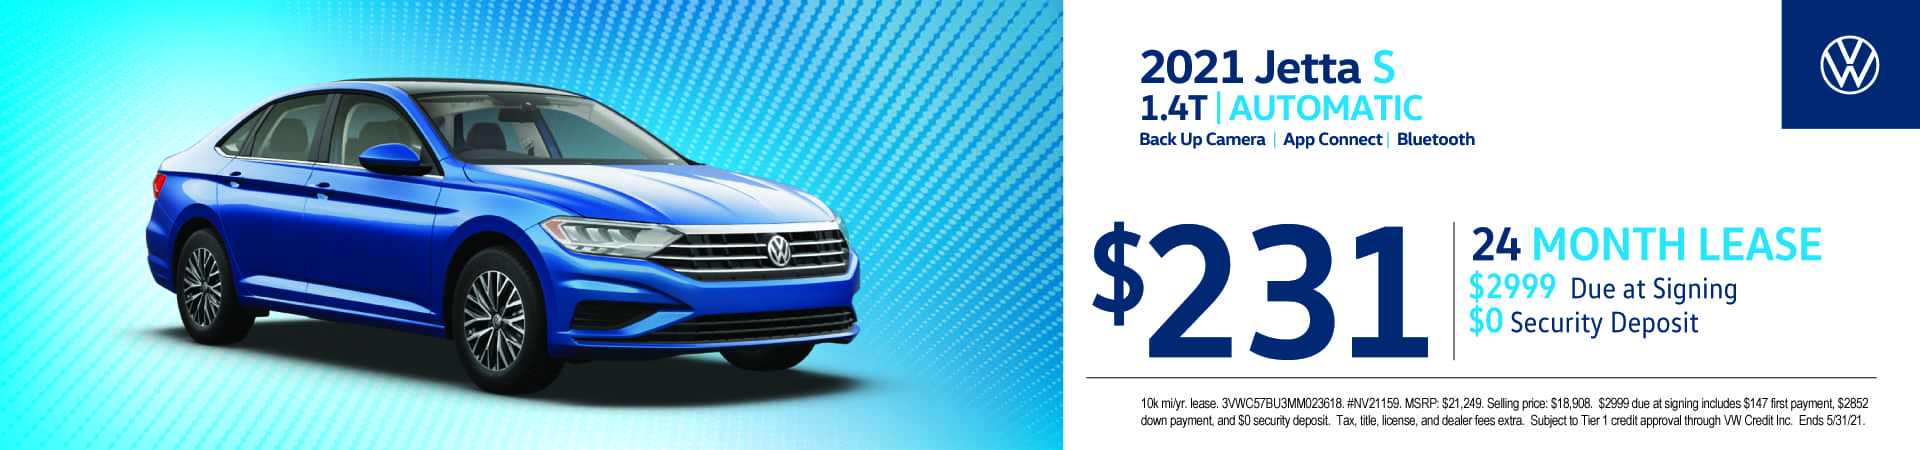 May-2021-VW-CS-Slides_2021-Jetta-S